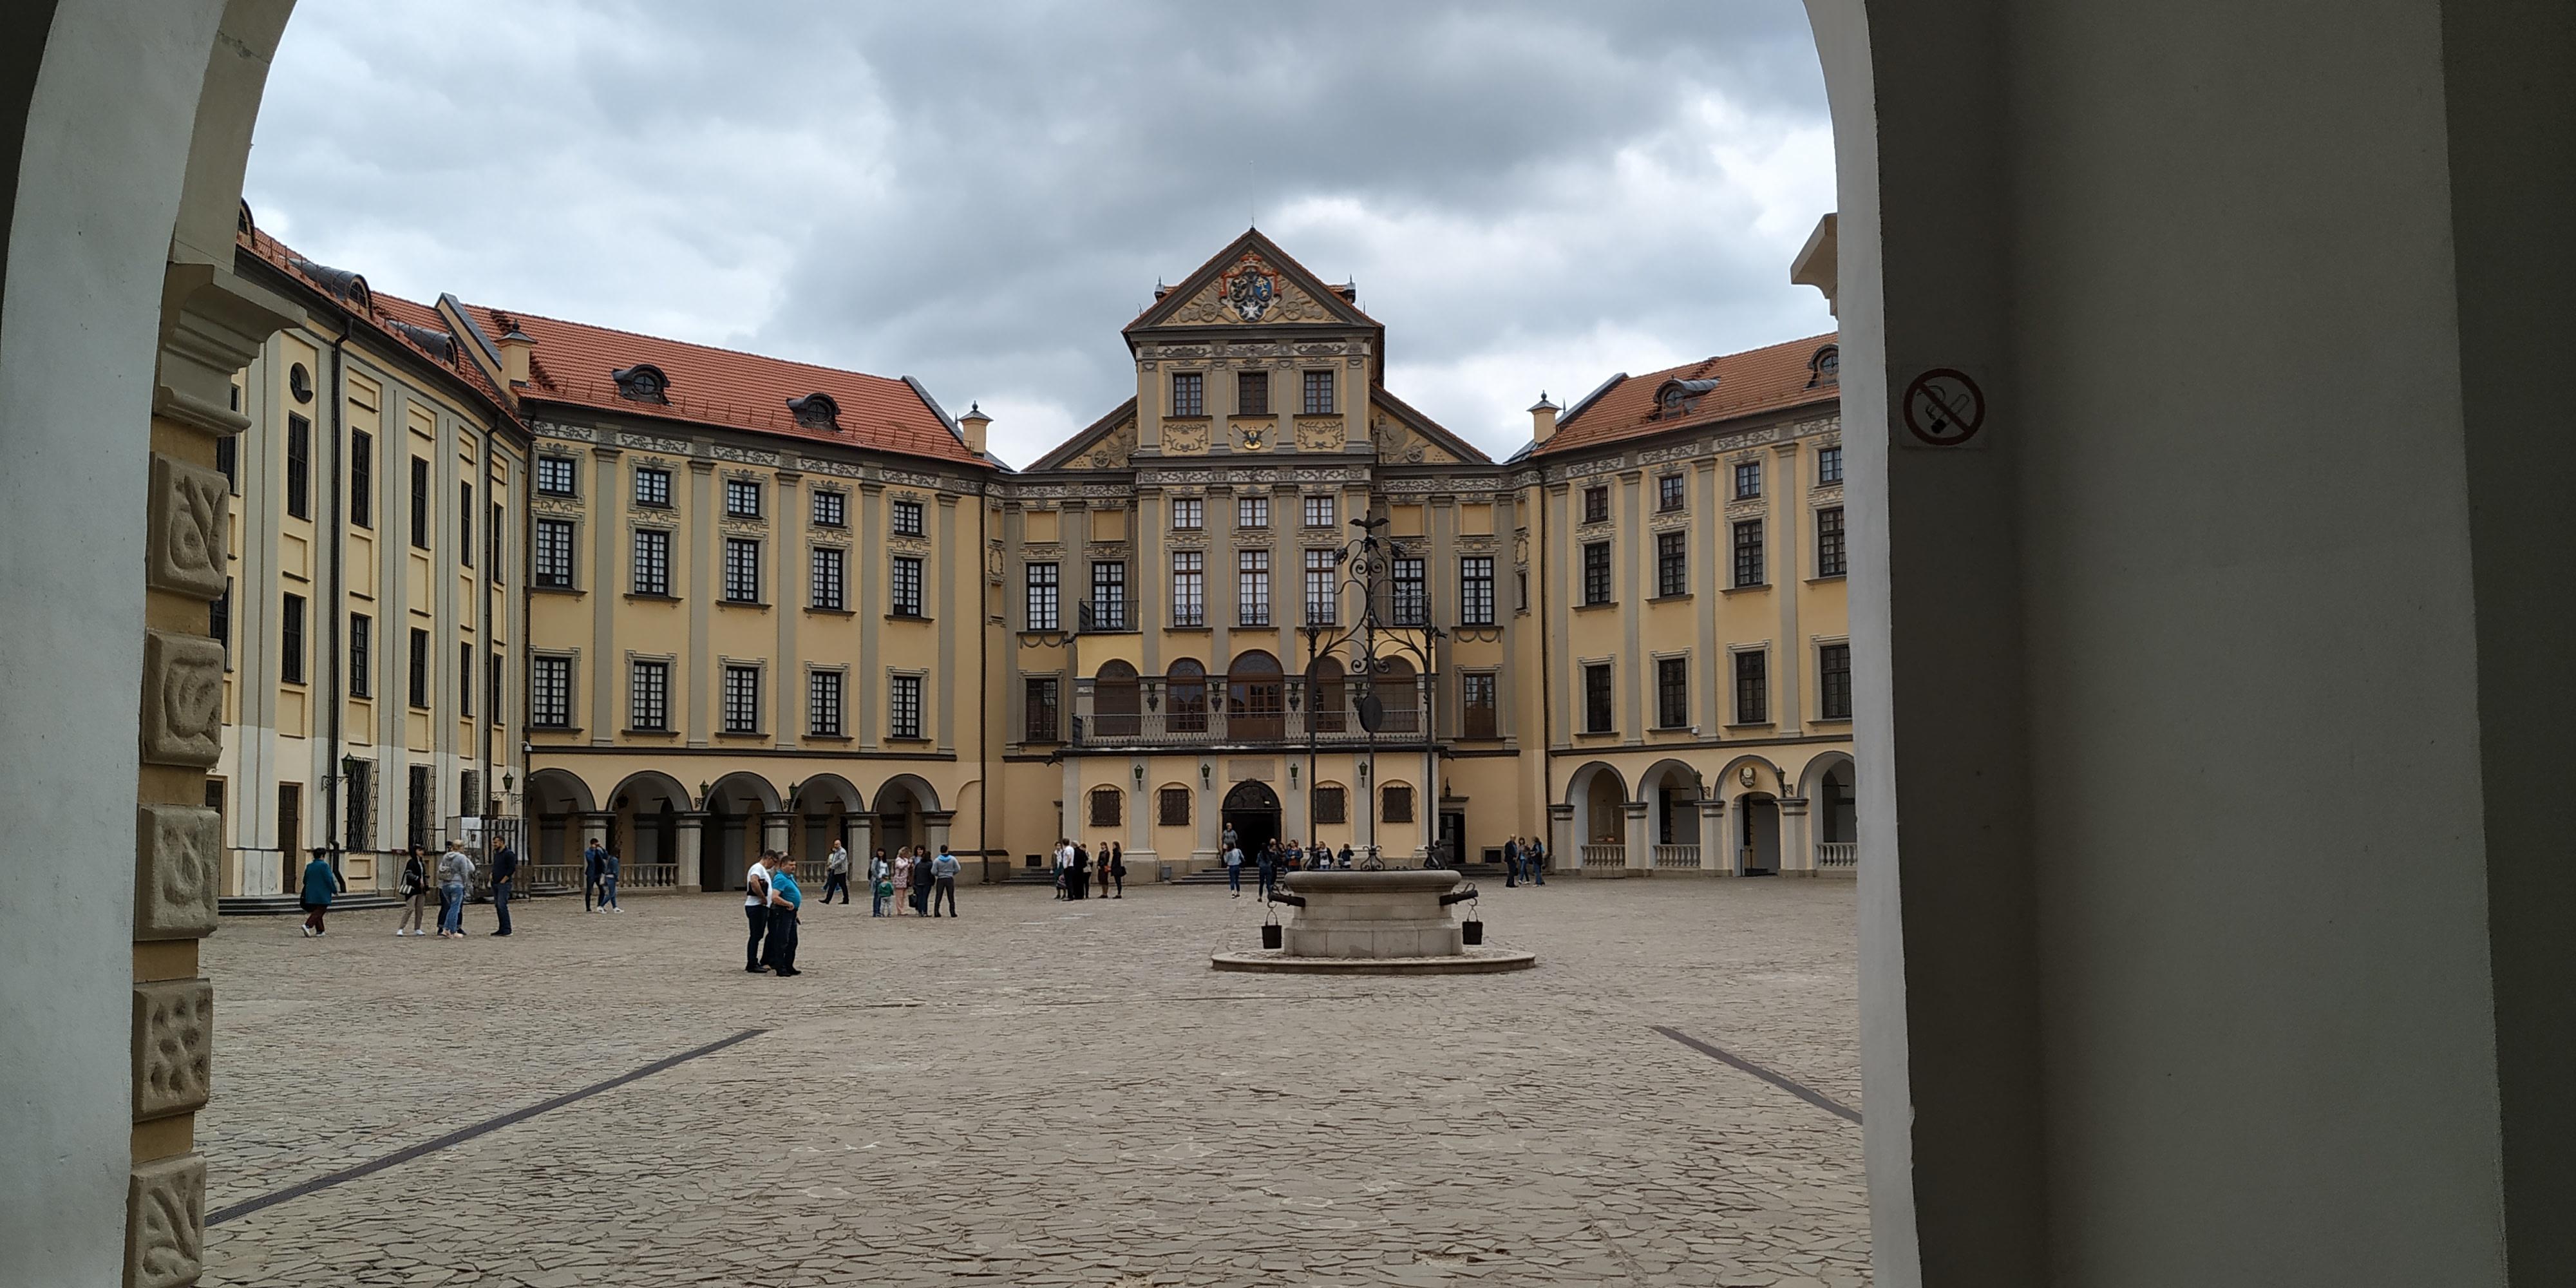 Inside the Nesvizh Castle